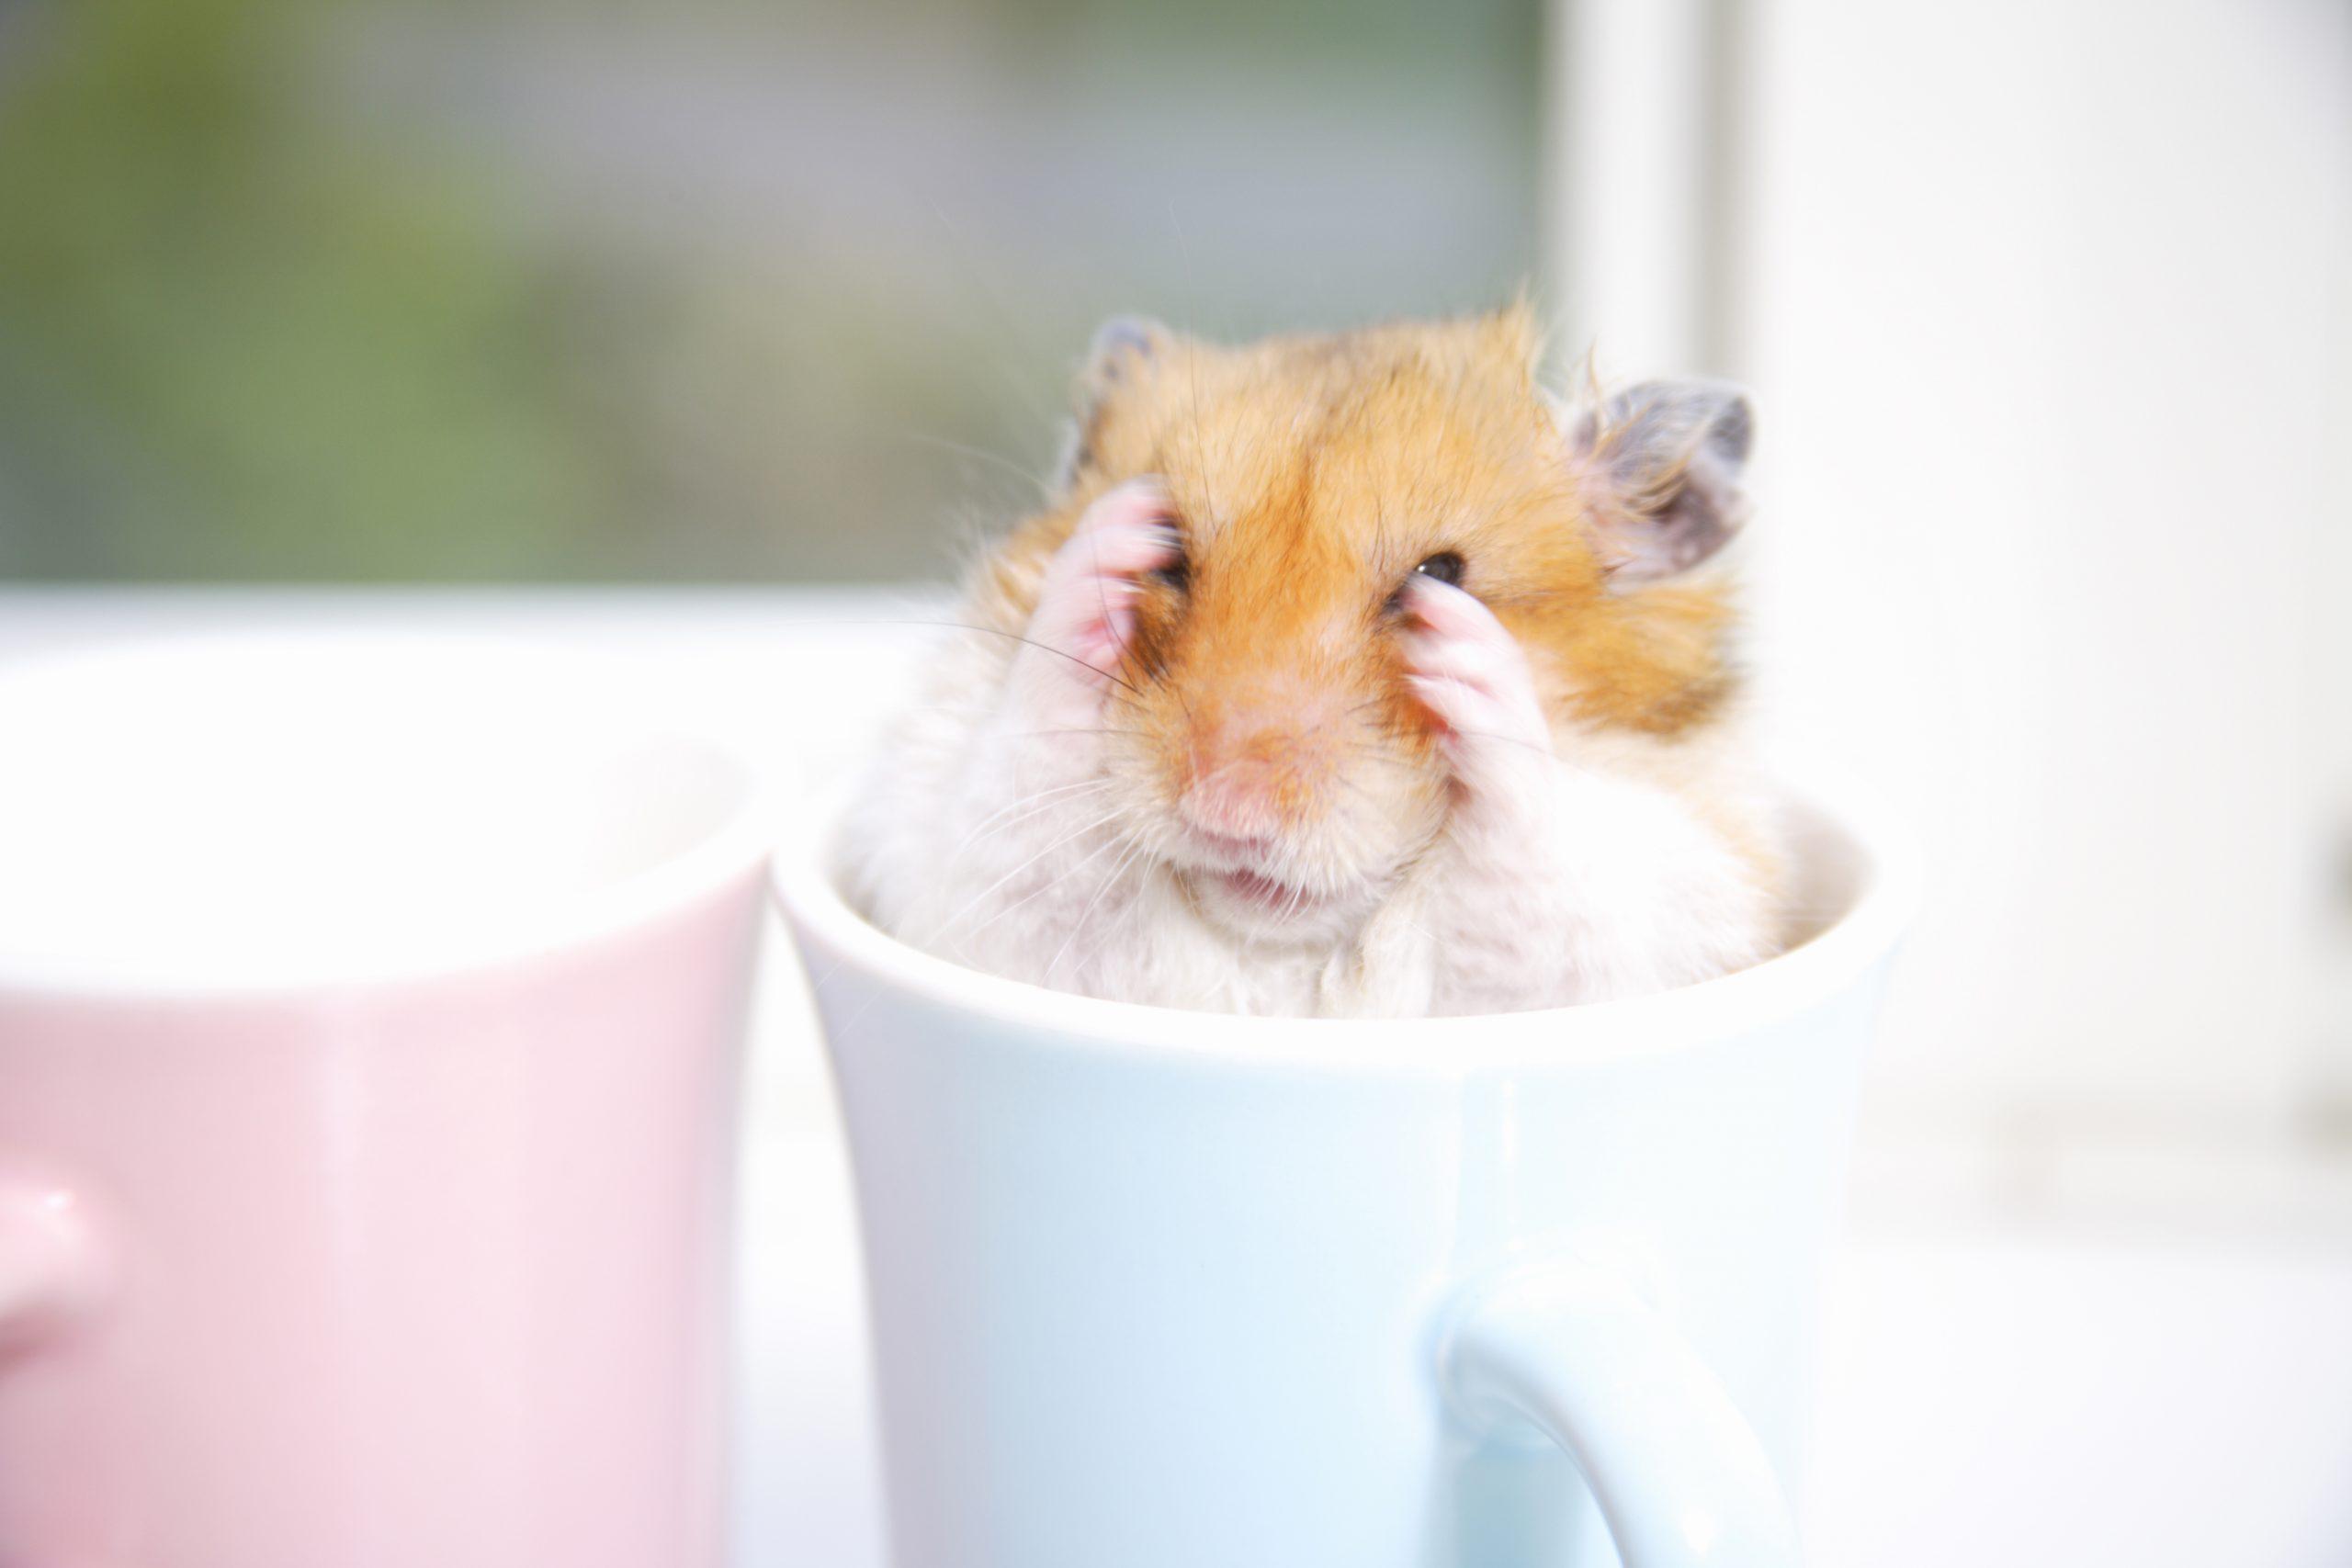 Hamsters in the mug